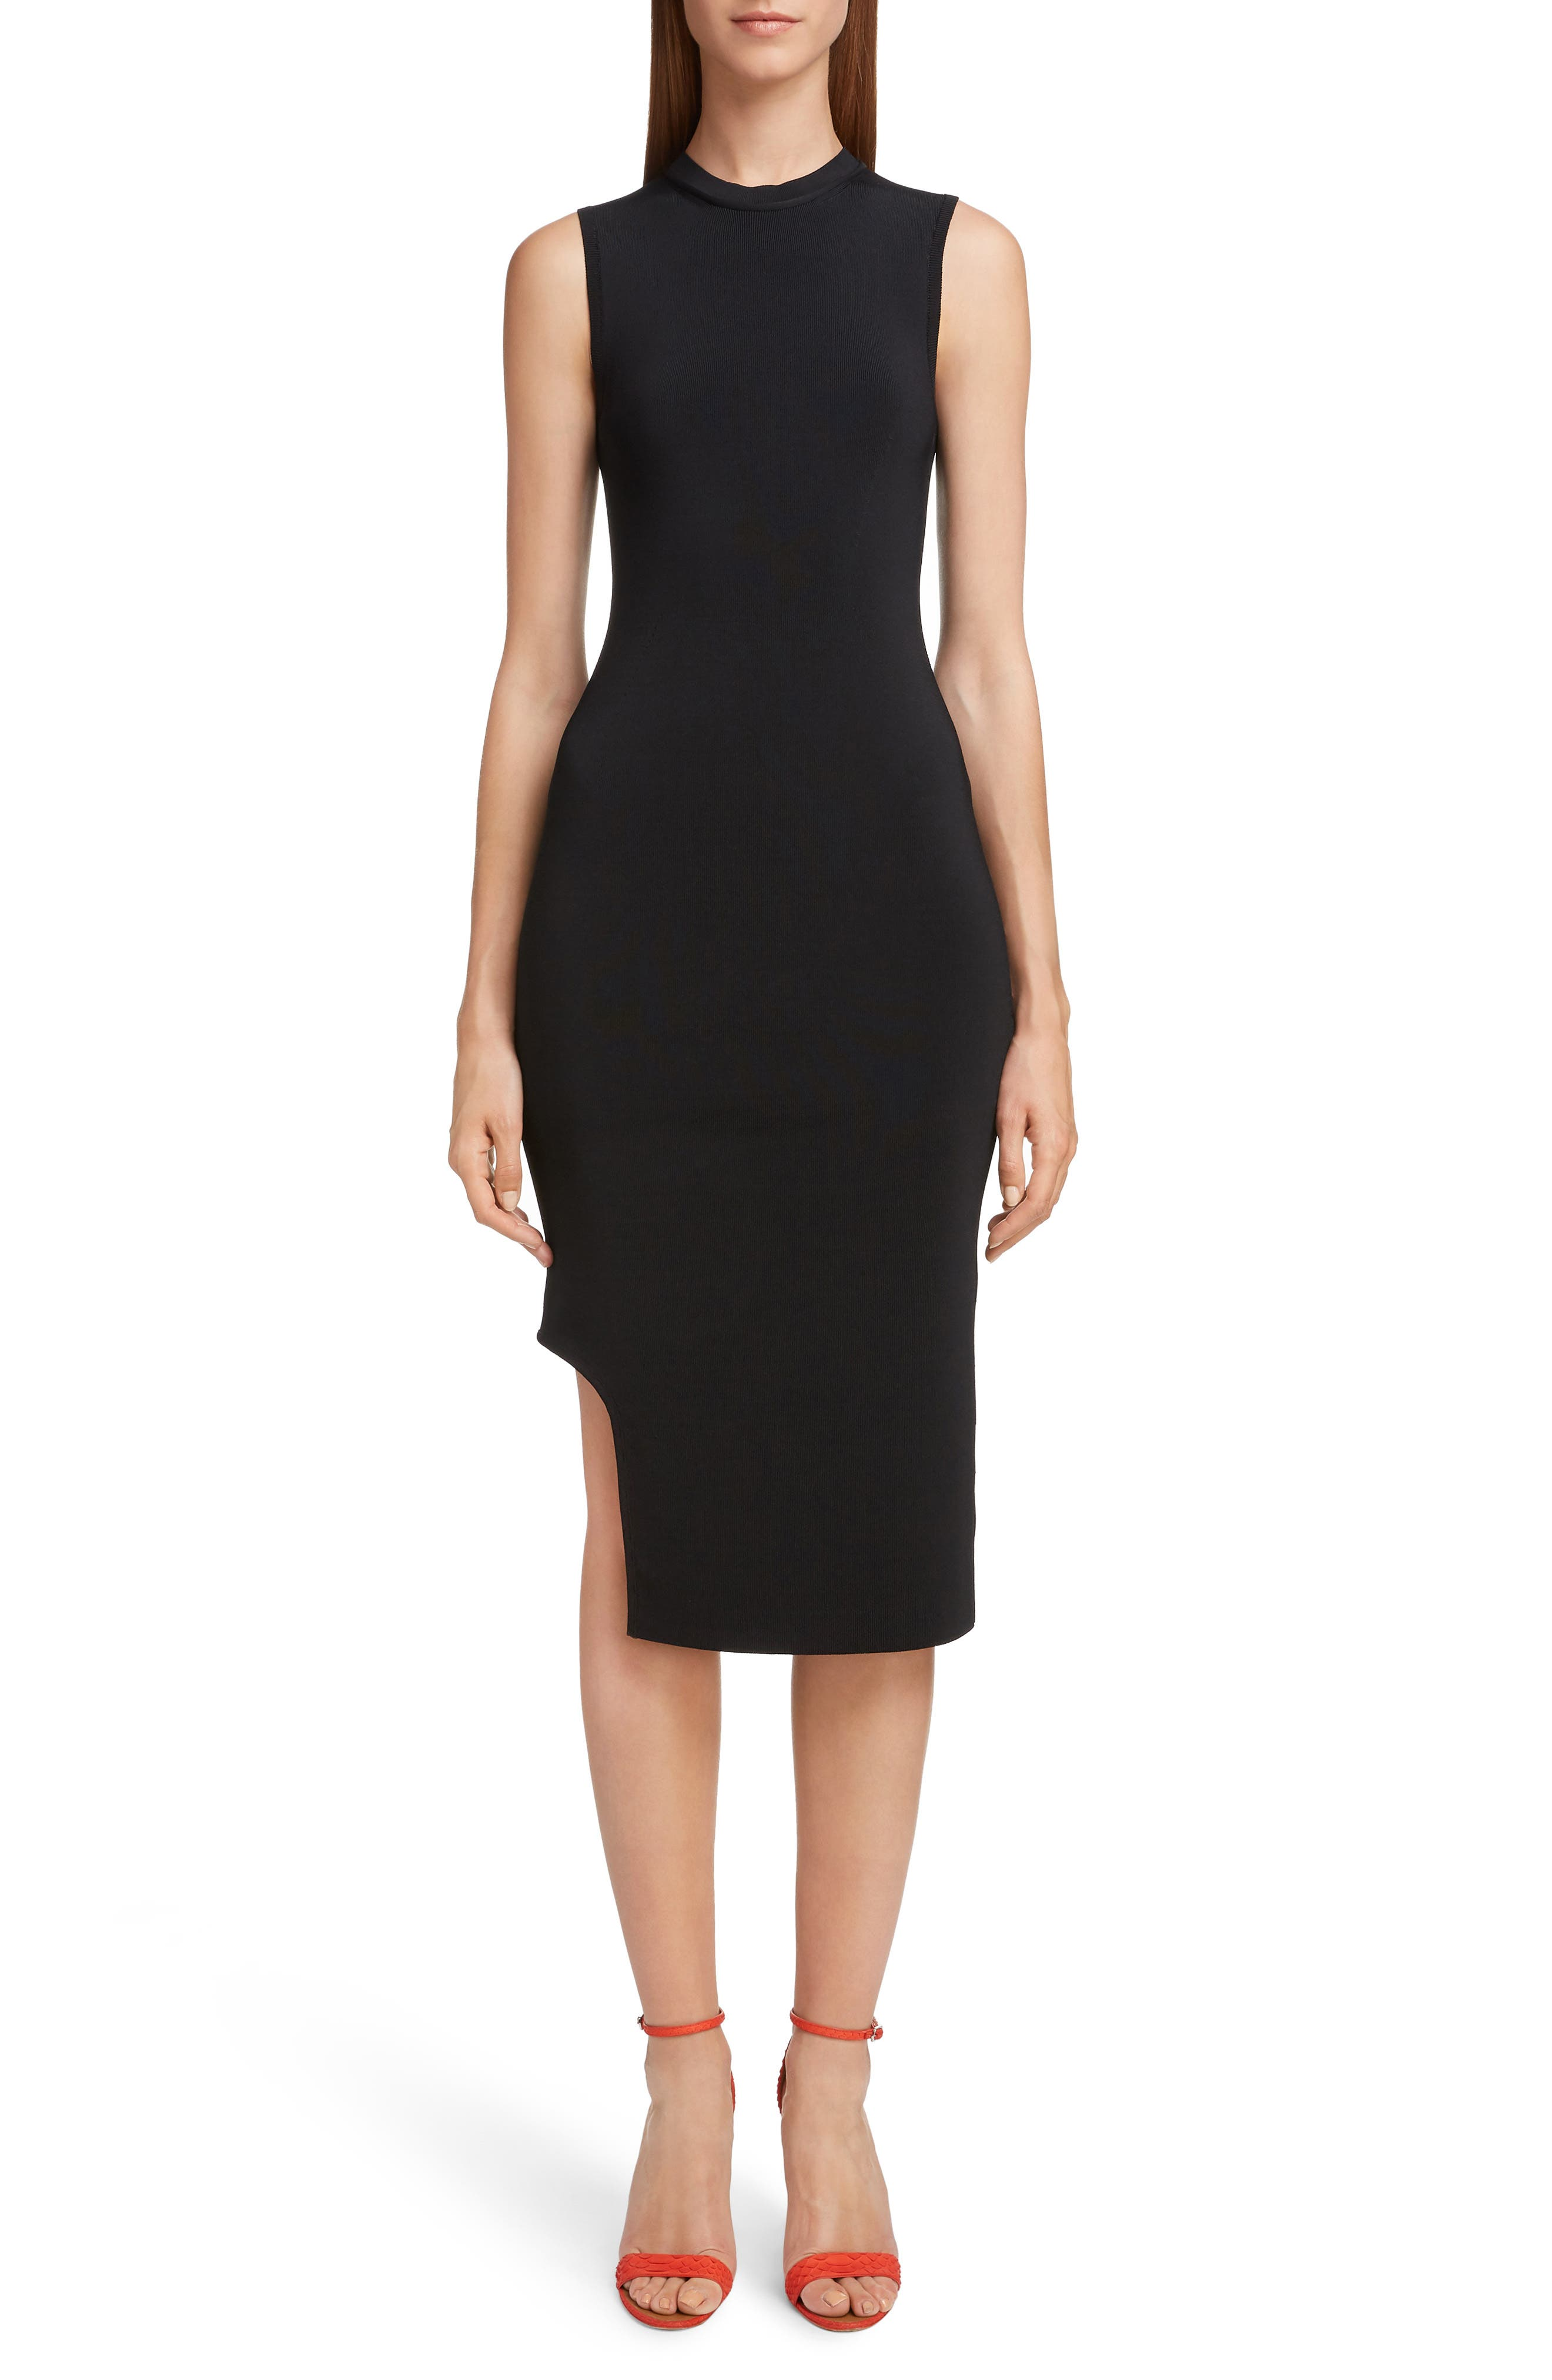 VICTORIA BECKHAM, Cutout Knit Dress, Main thumbnail 1, color, BLACK